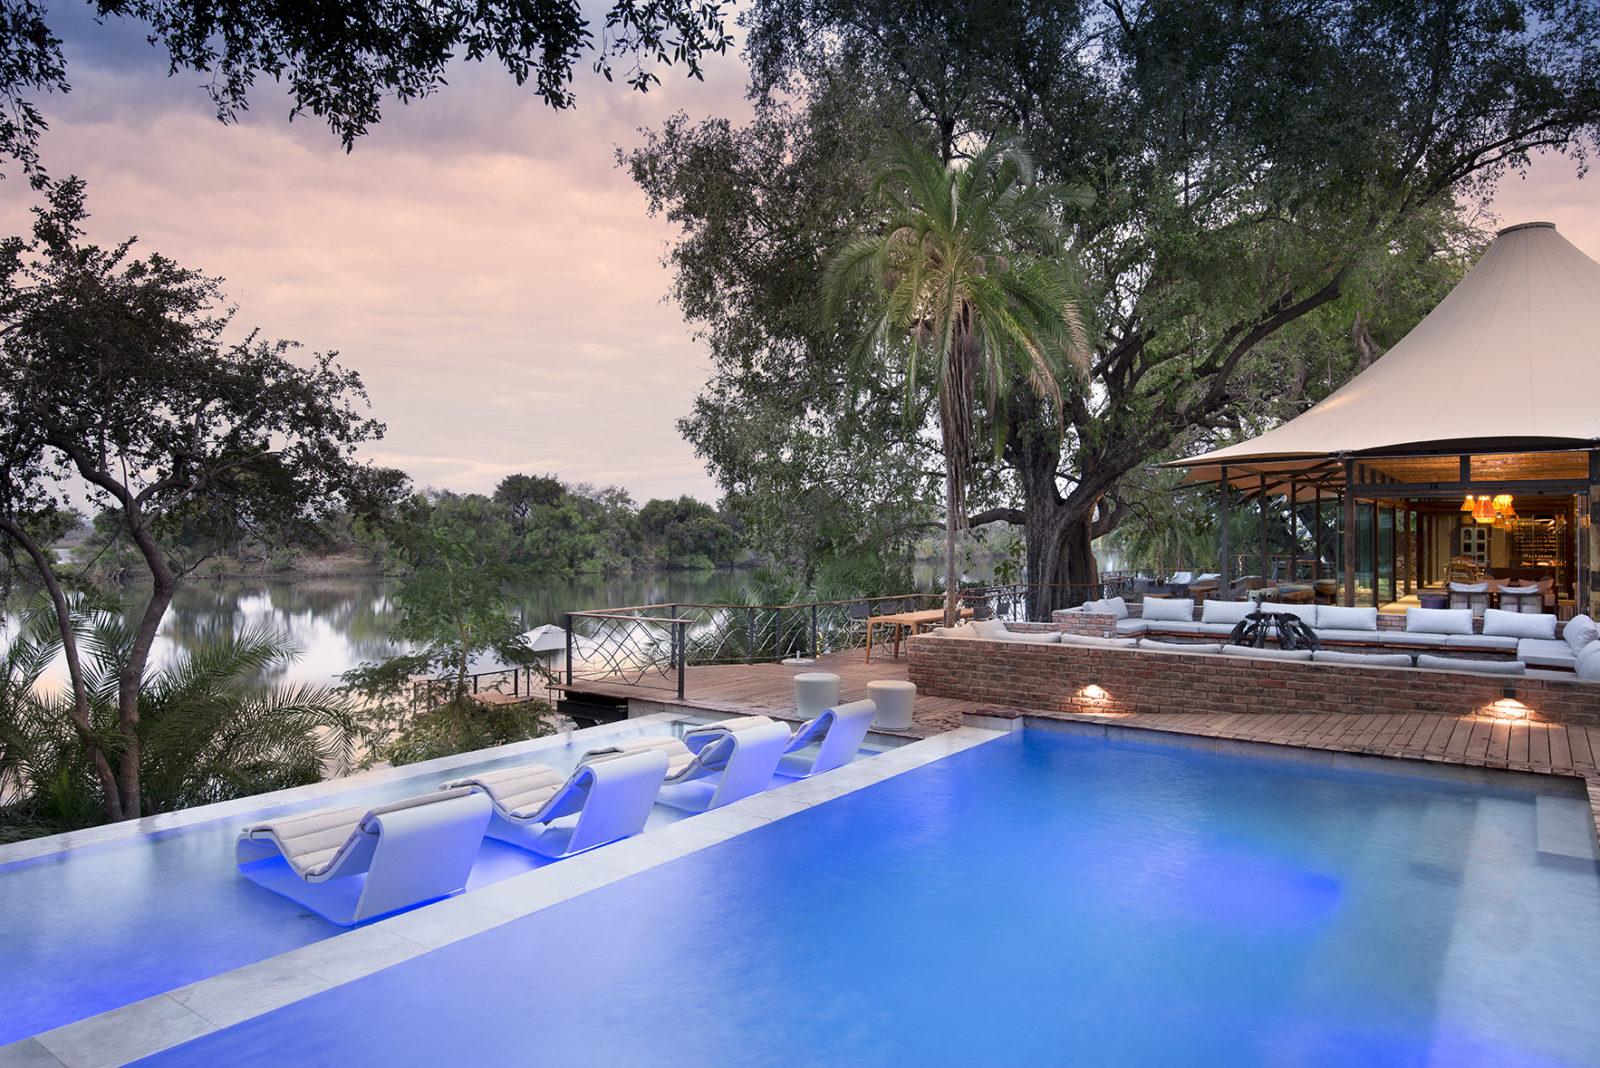 Swimming pool views at Thorntree Lodge